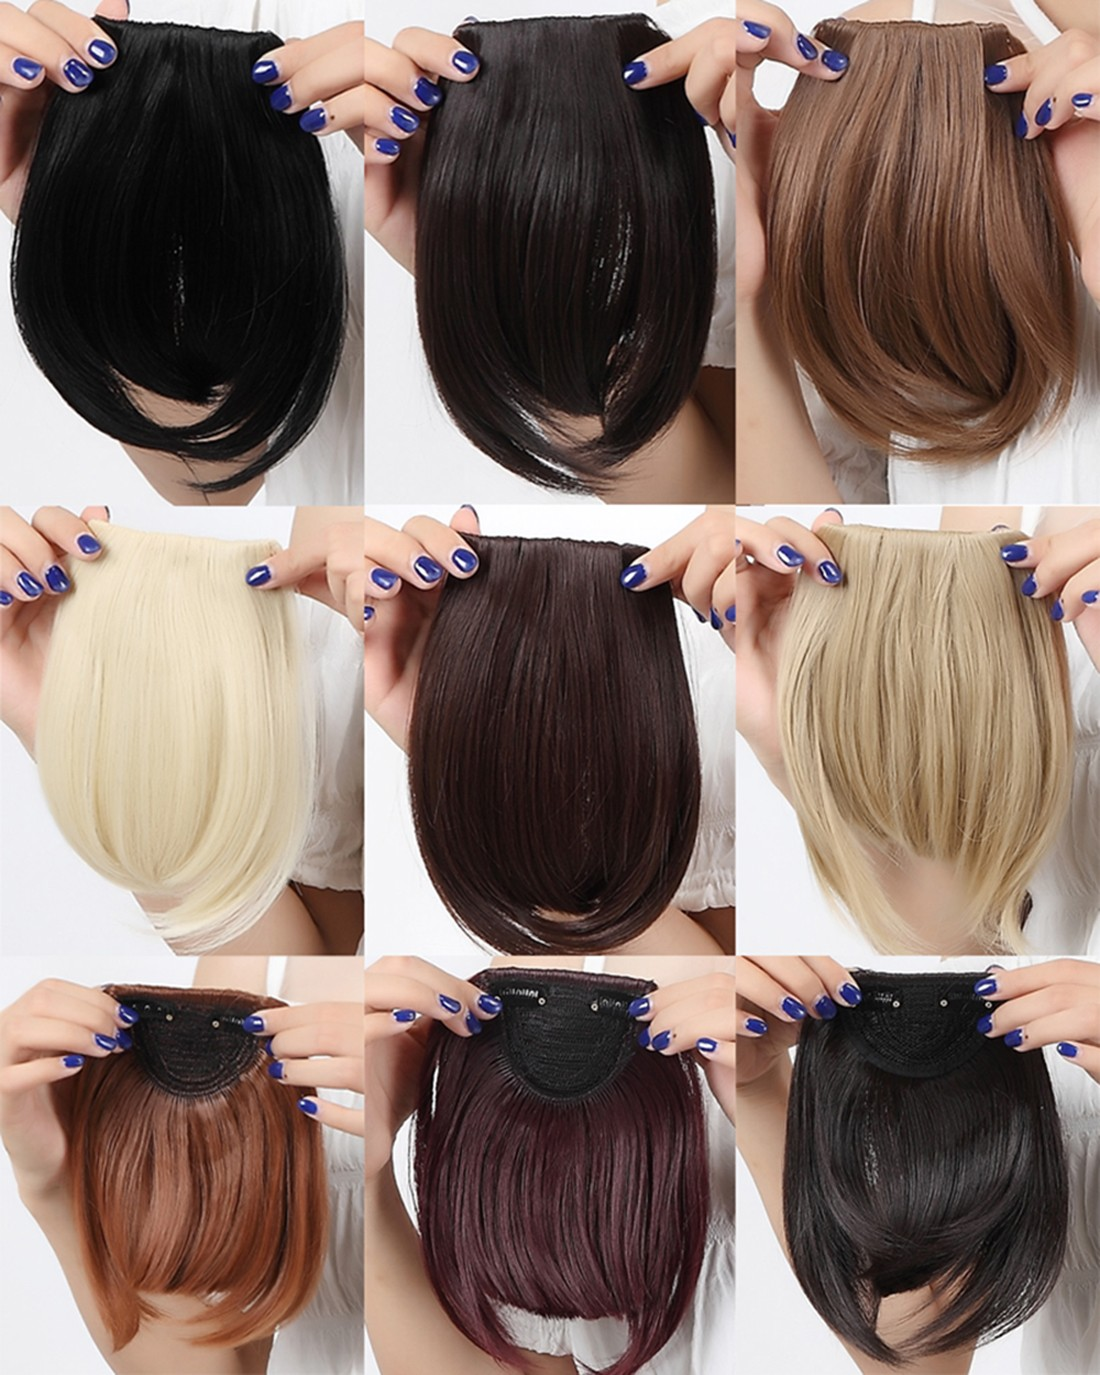 Us Clip In On Bangs Fringes Hair Extensions Black Brown Blonde Neat